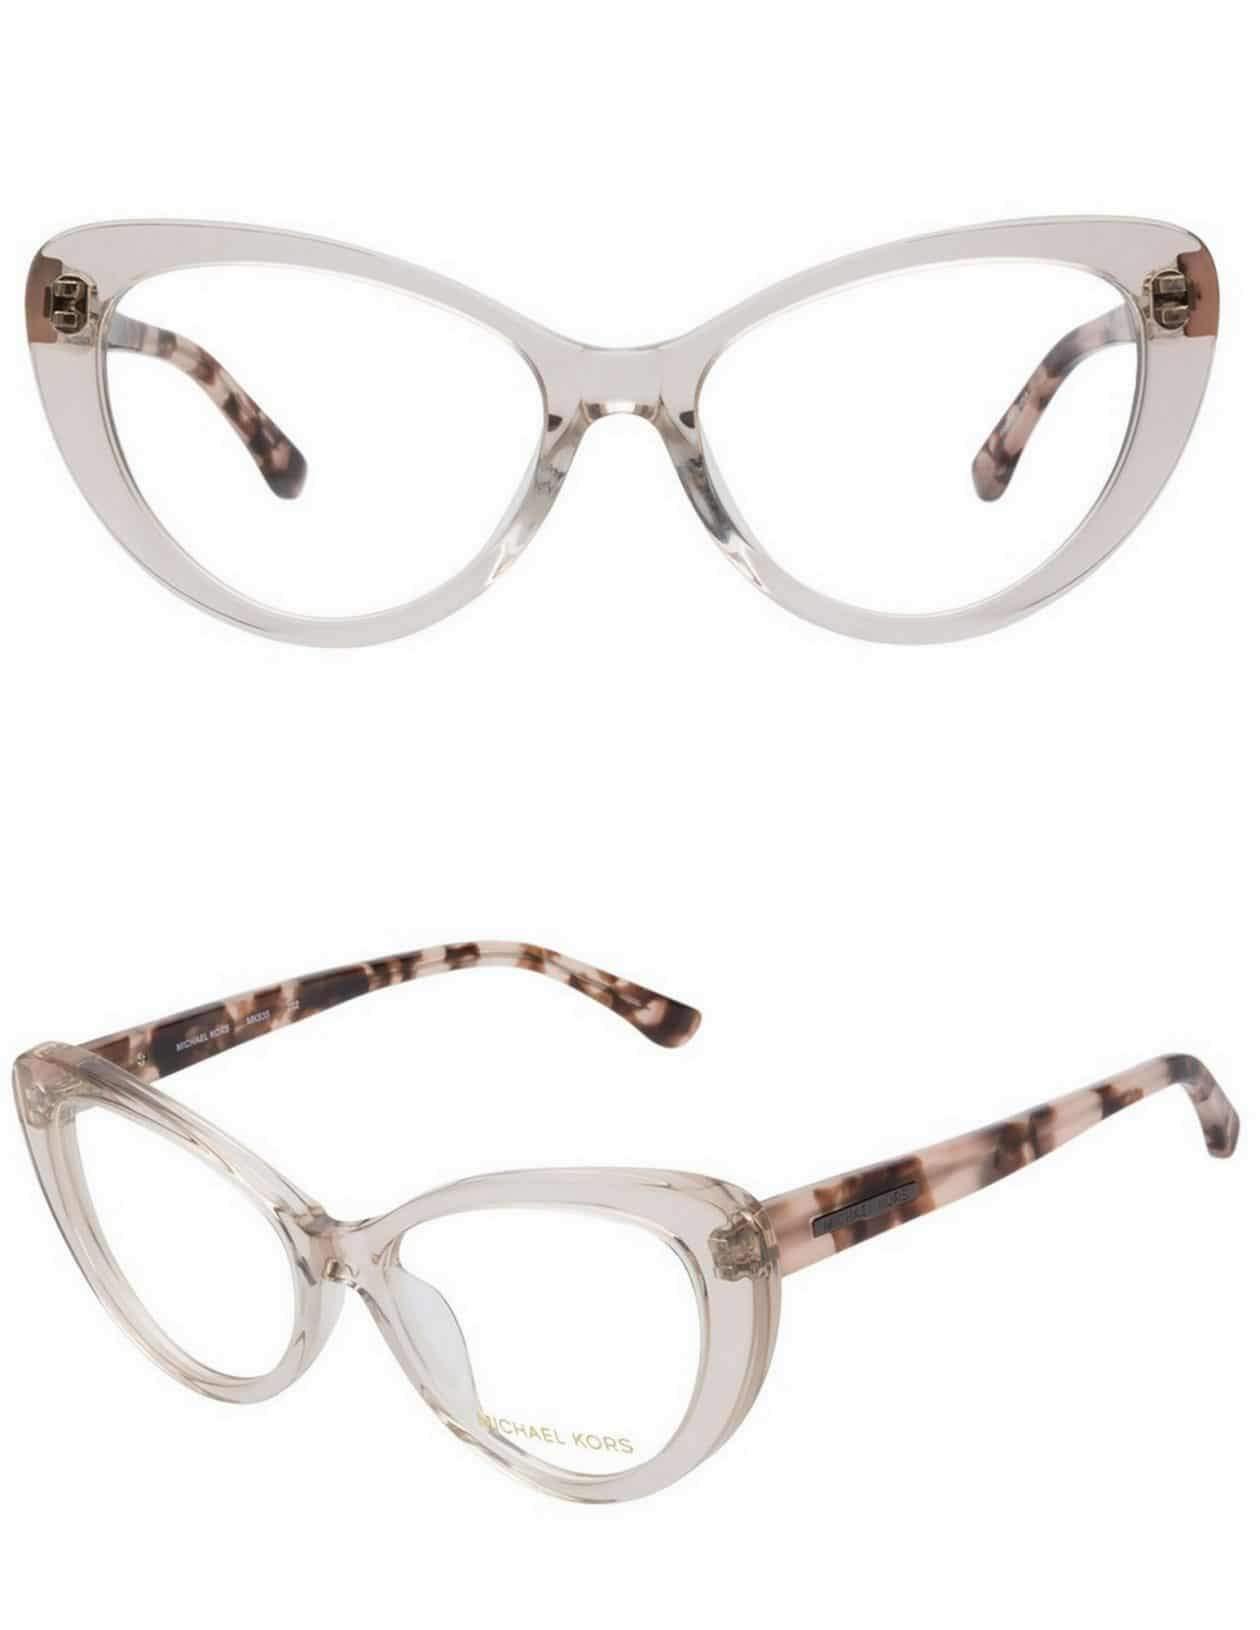 My New Michael Kors Clear Cat Eye Glasses from Coastal.com